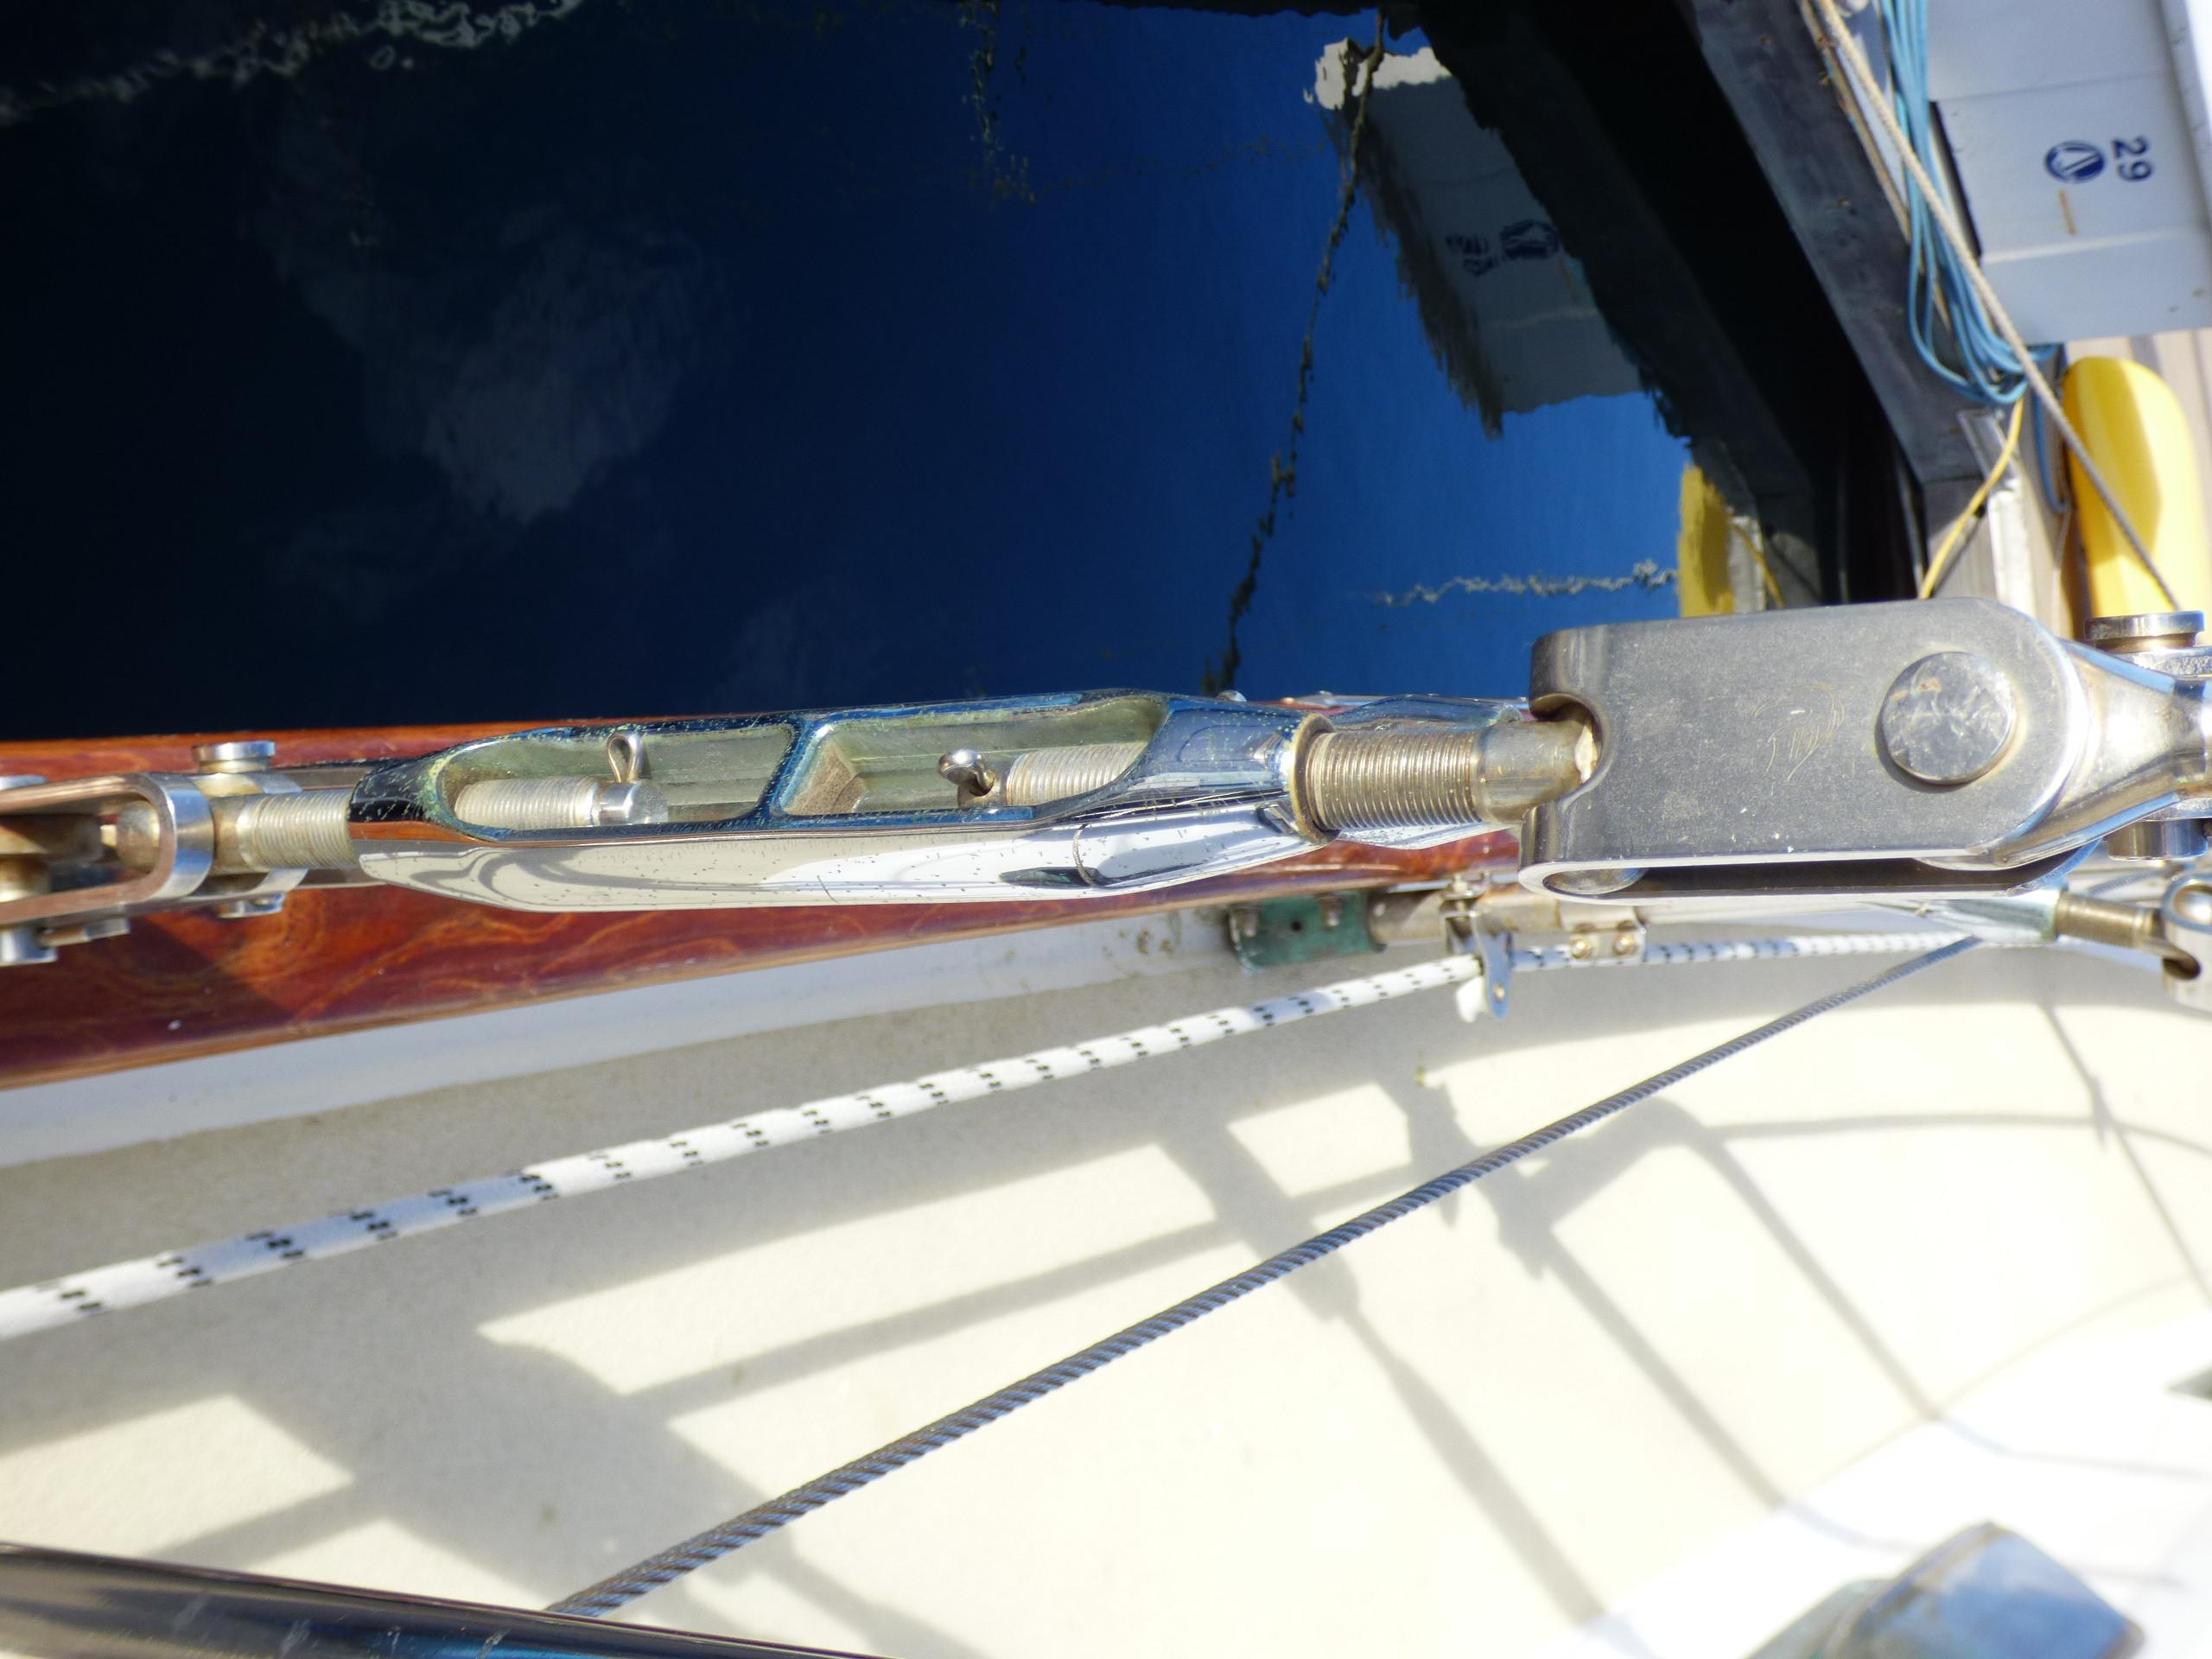 46' Formosa 46 Cutter Center Cockpit 1981   Seacoast Yachts